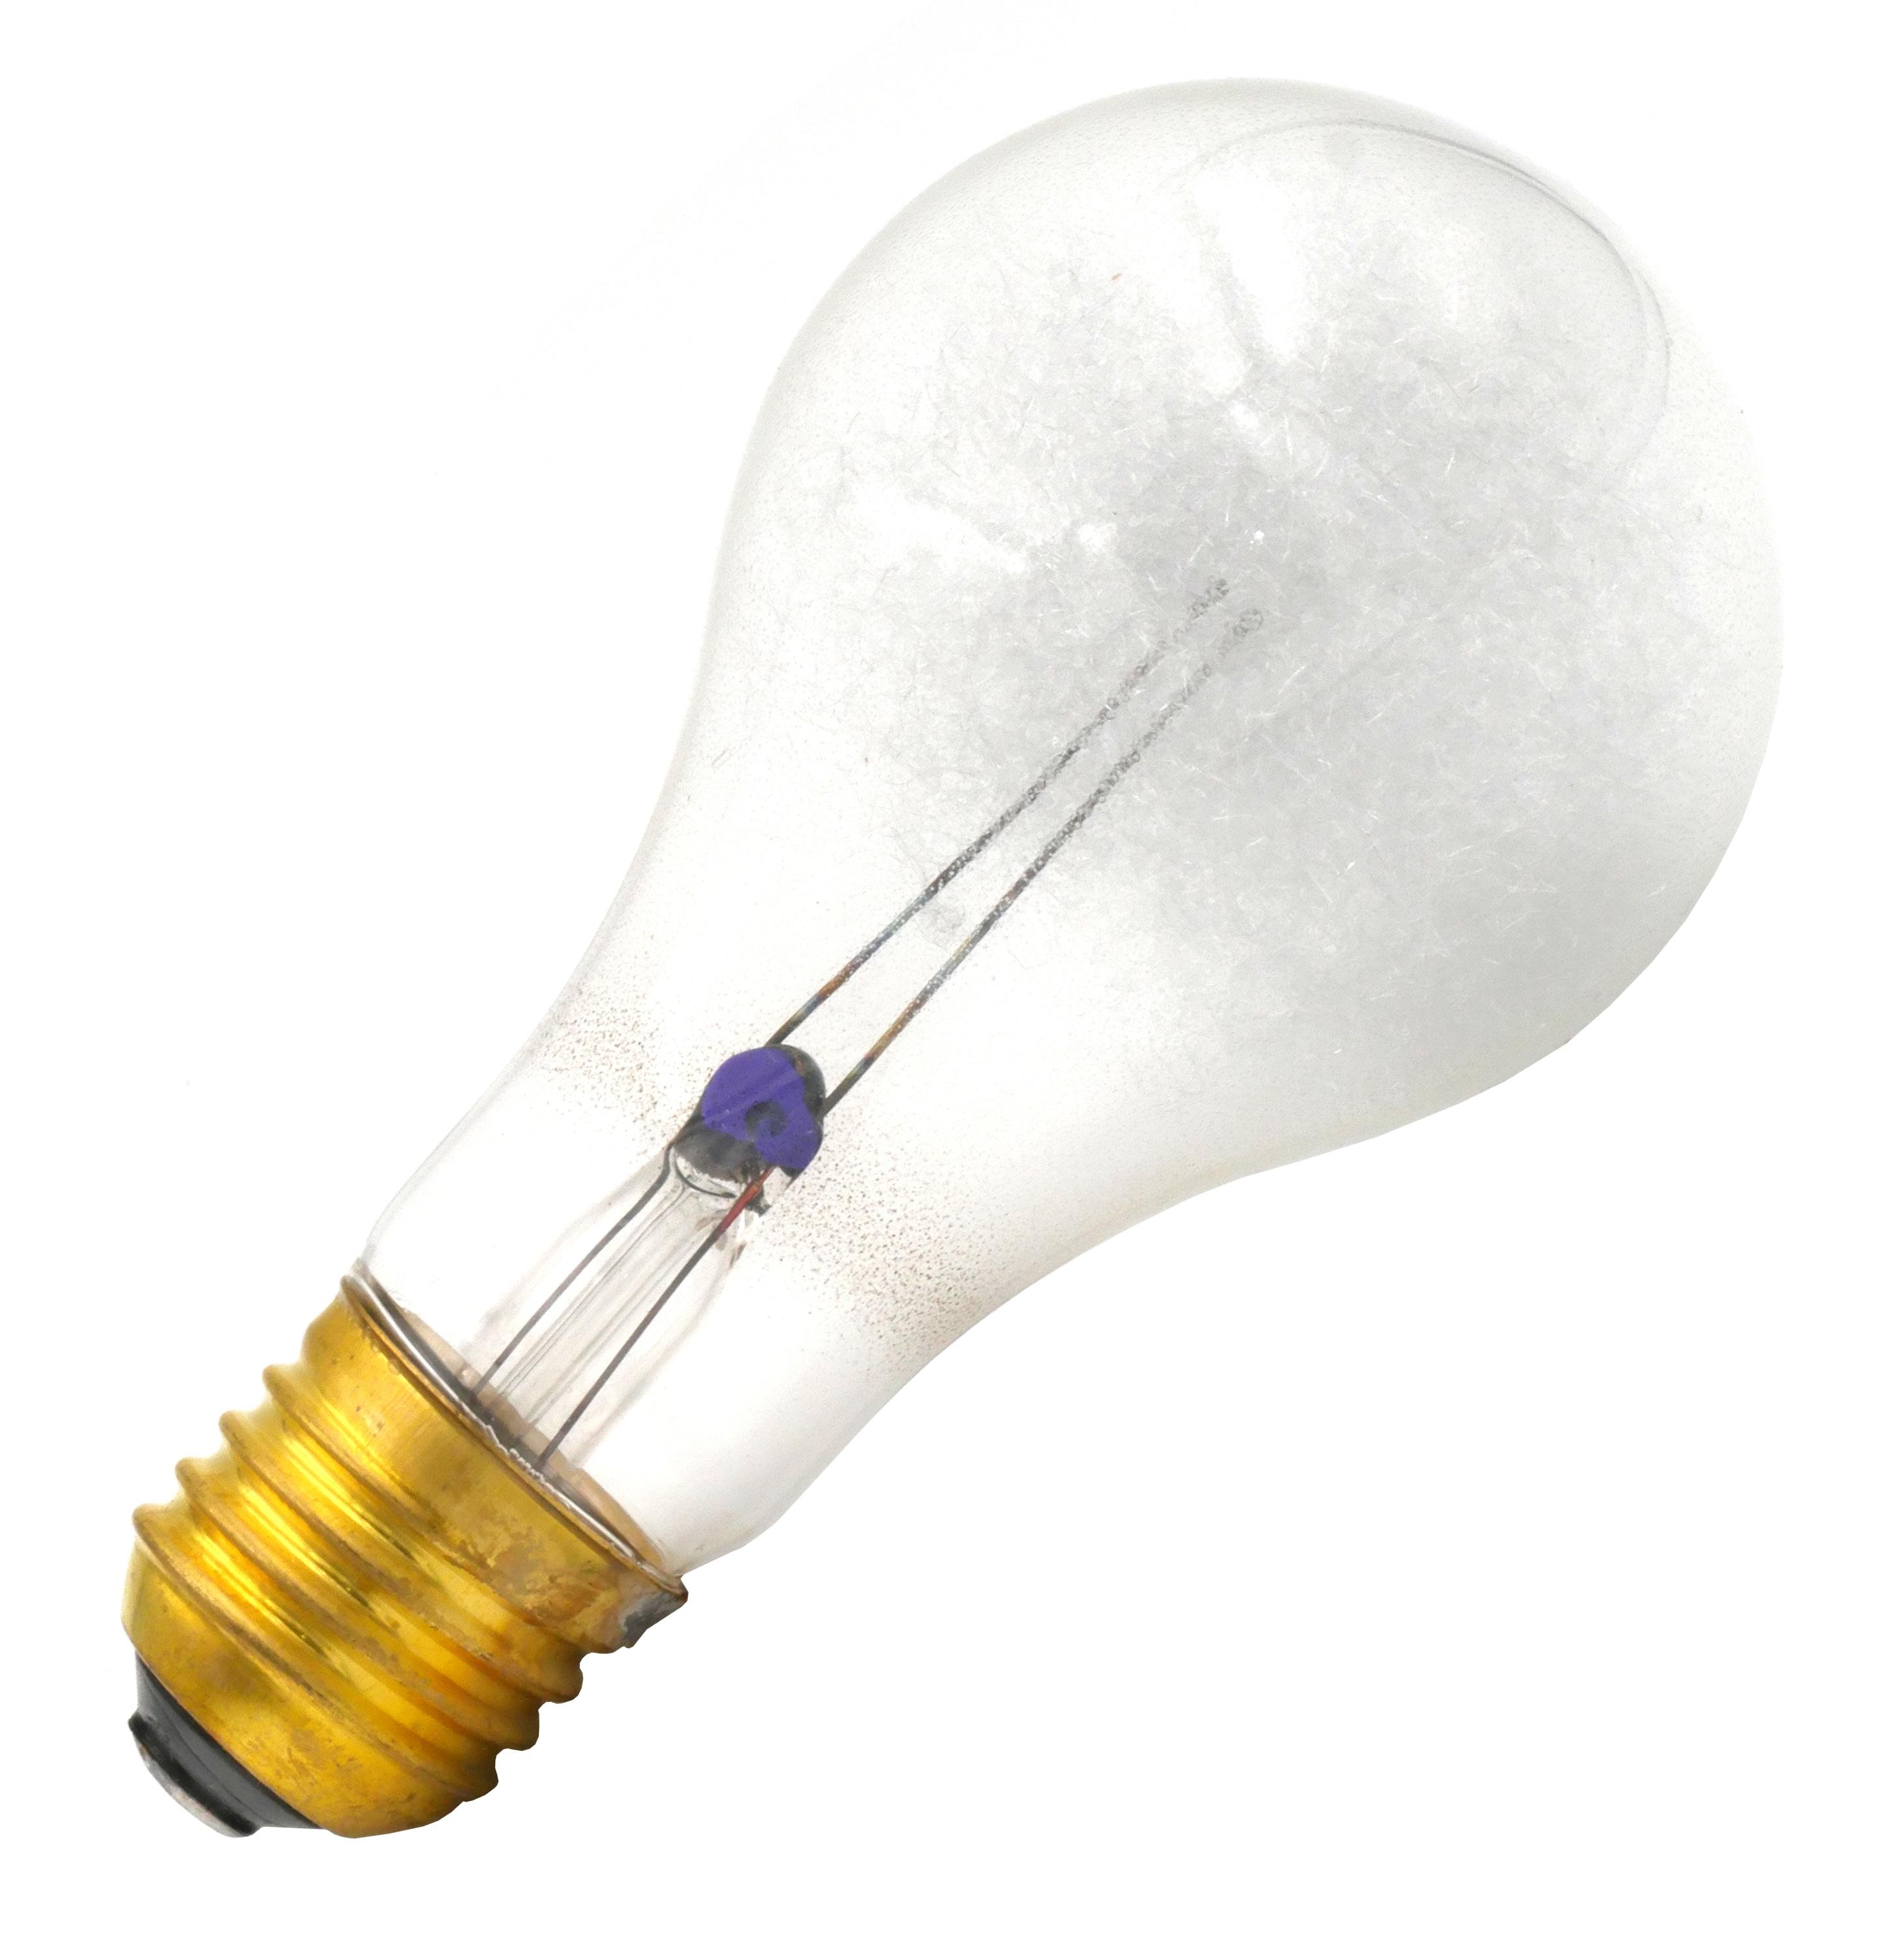 Blitzlampe 22 klar e27 flash fotolampen spezial for Foto lampen